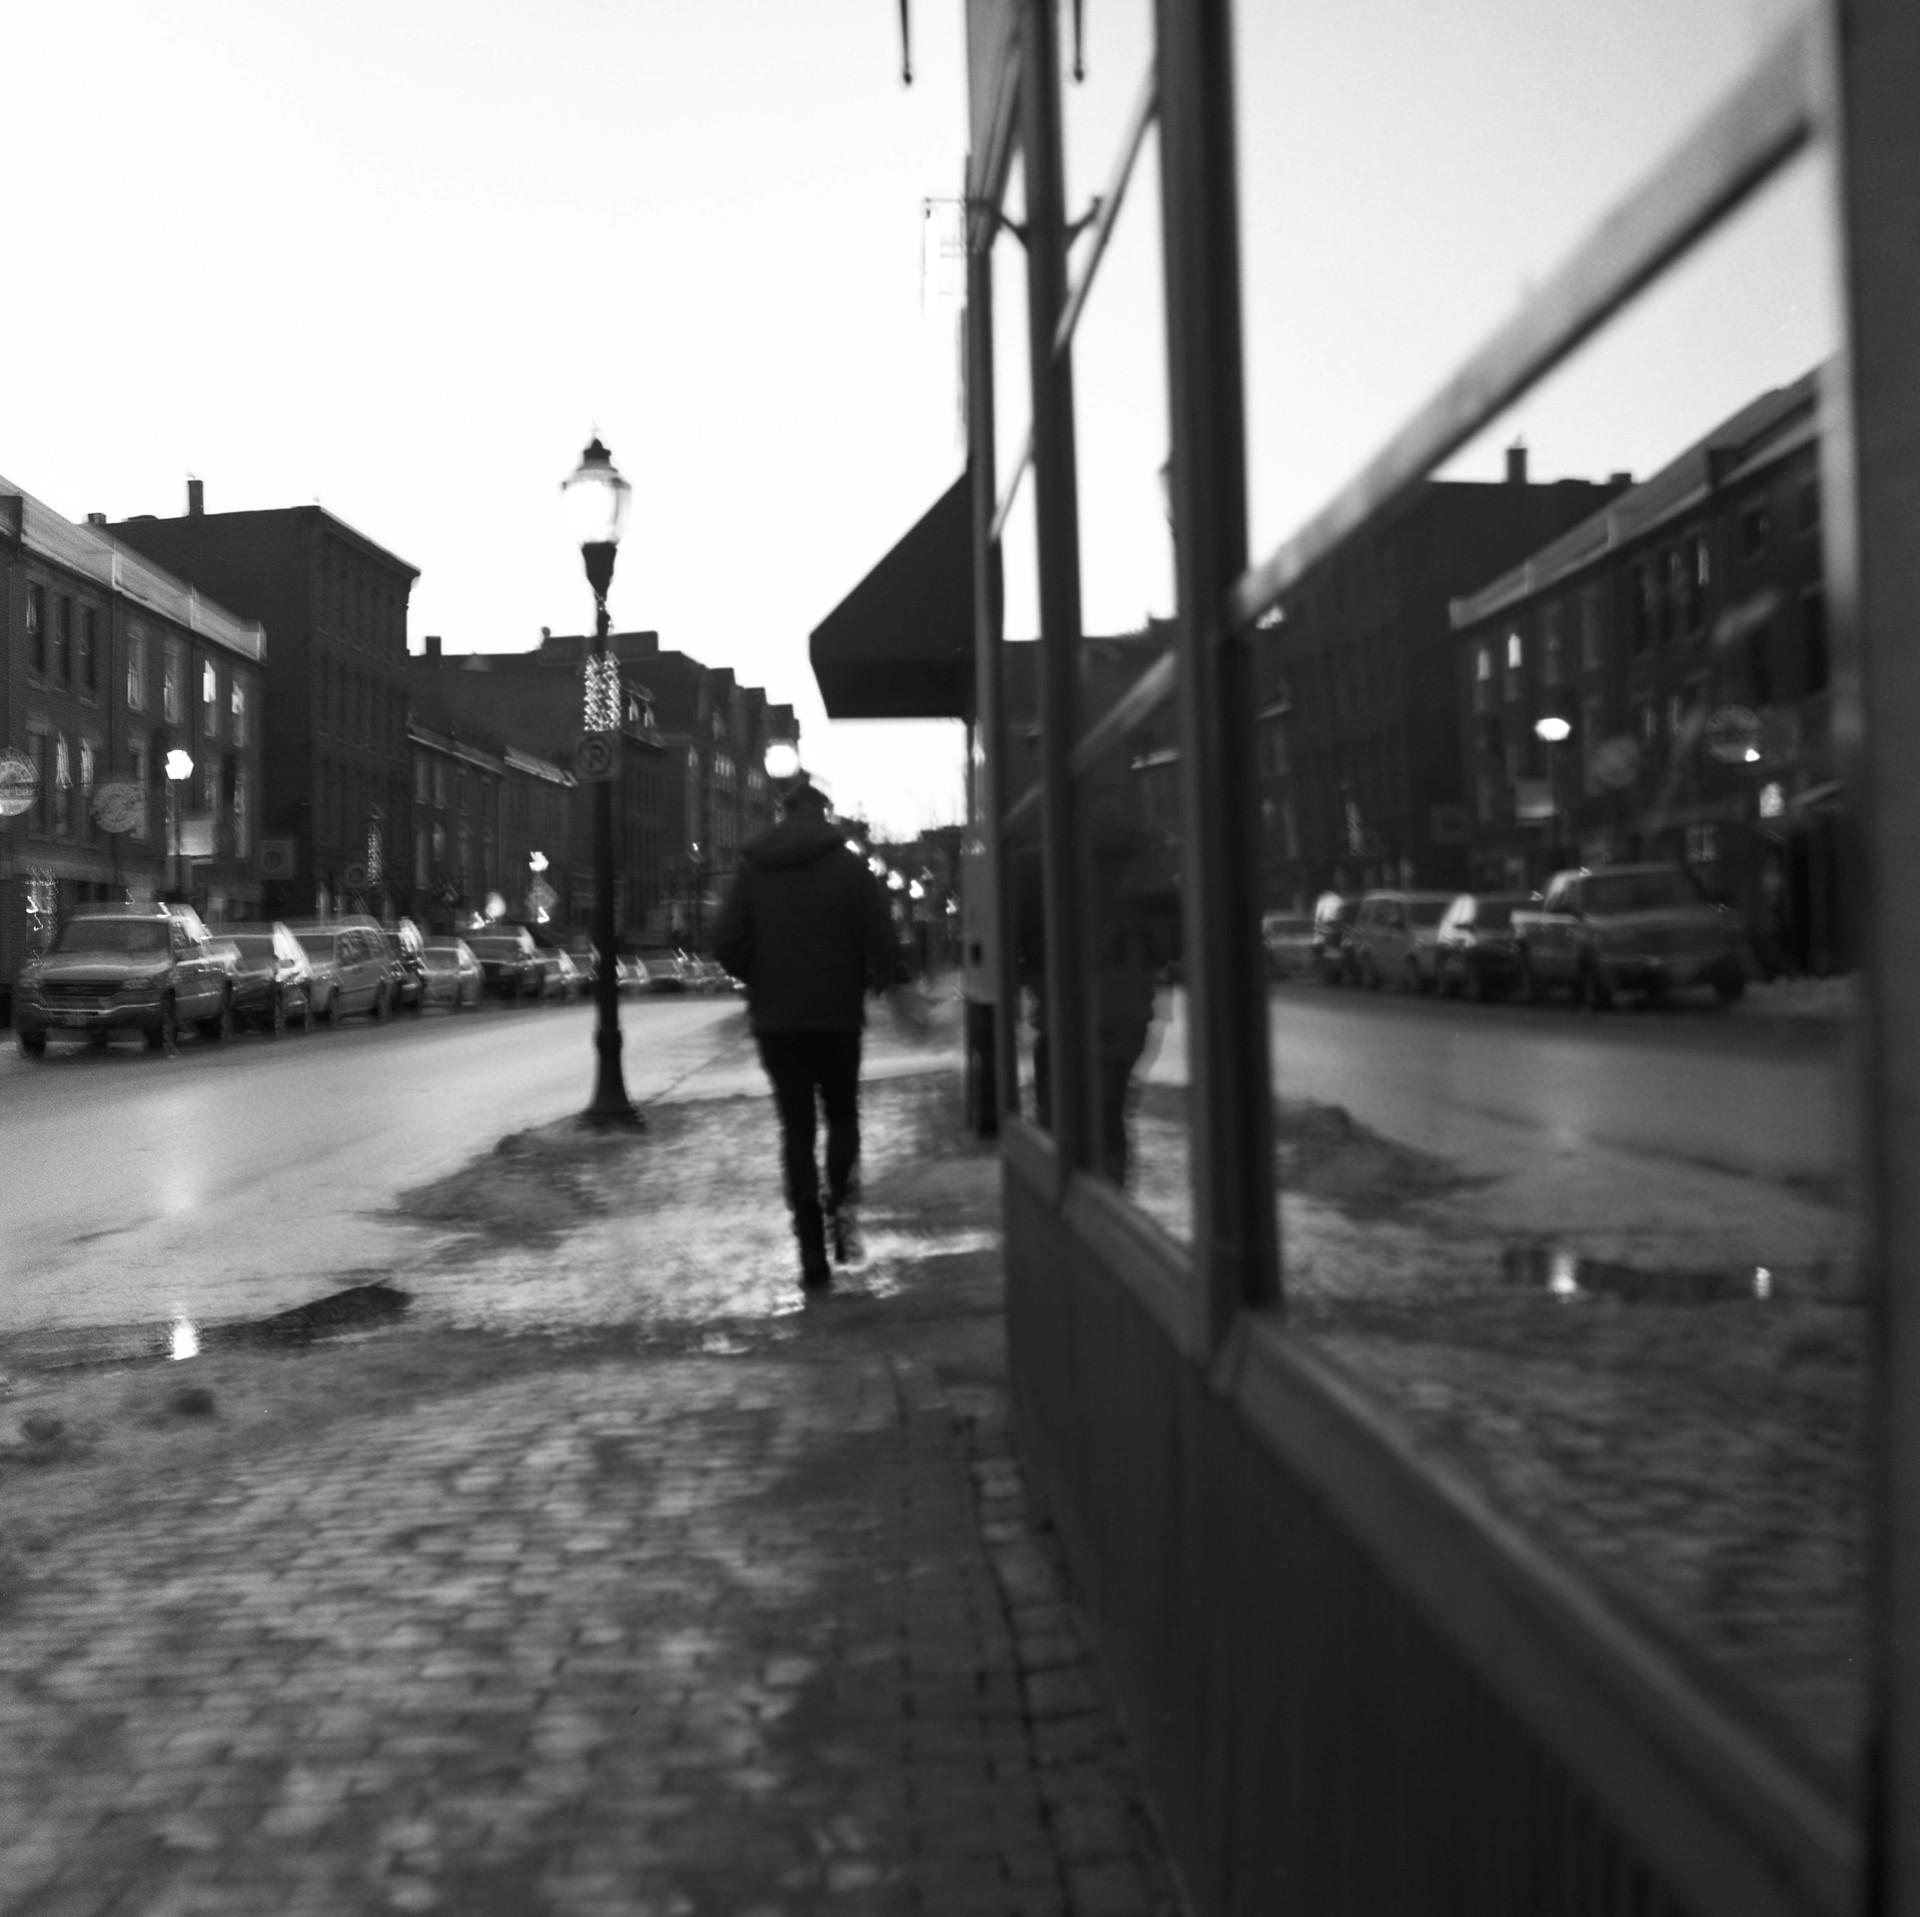 salted sidewalk